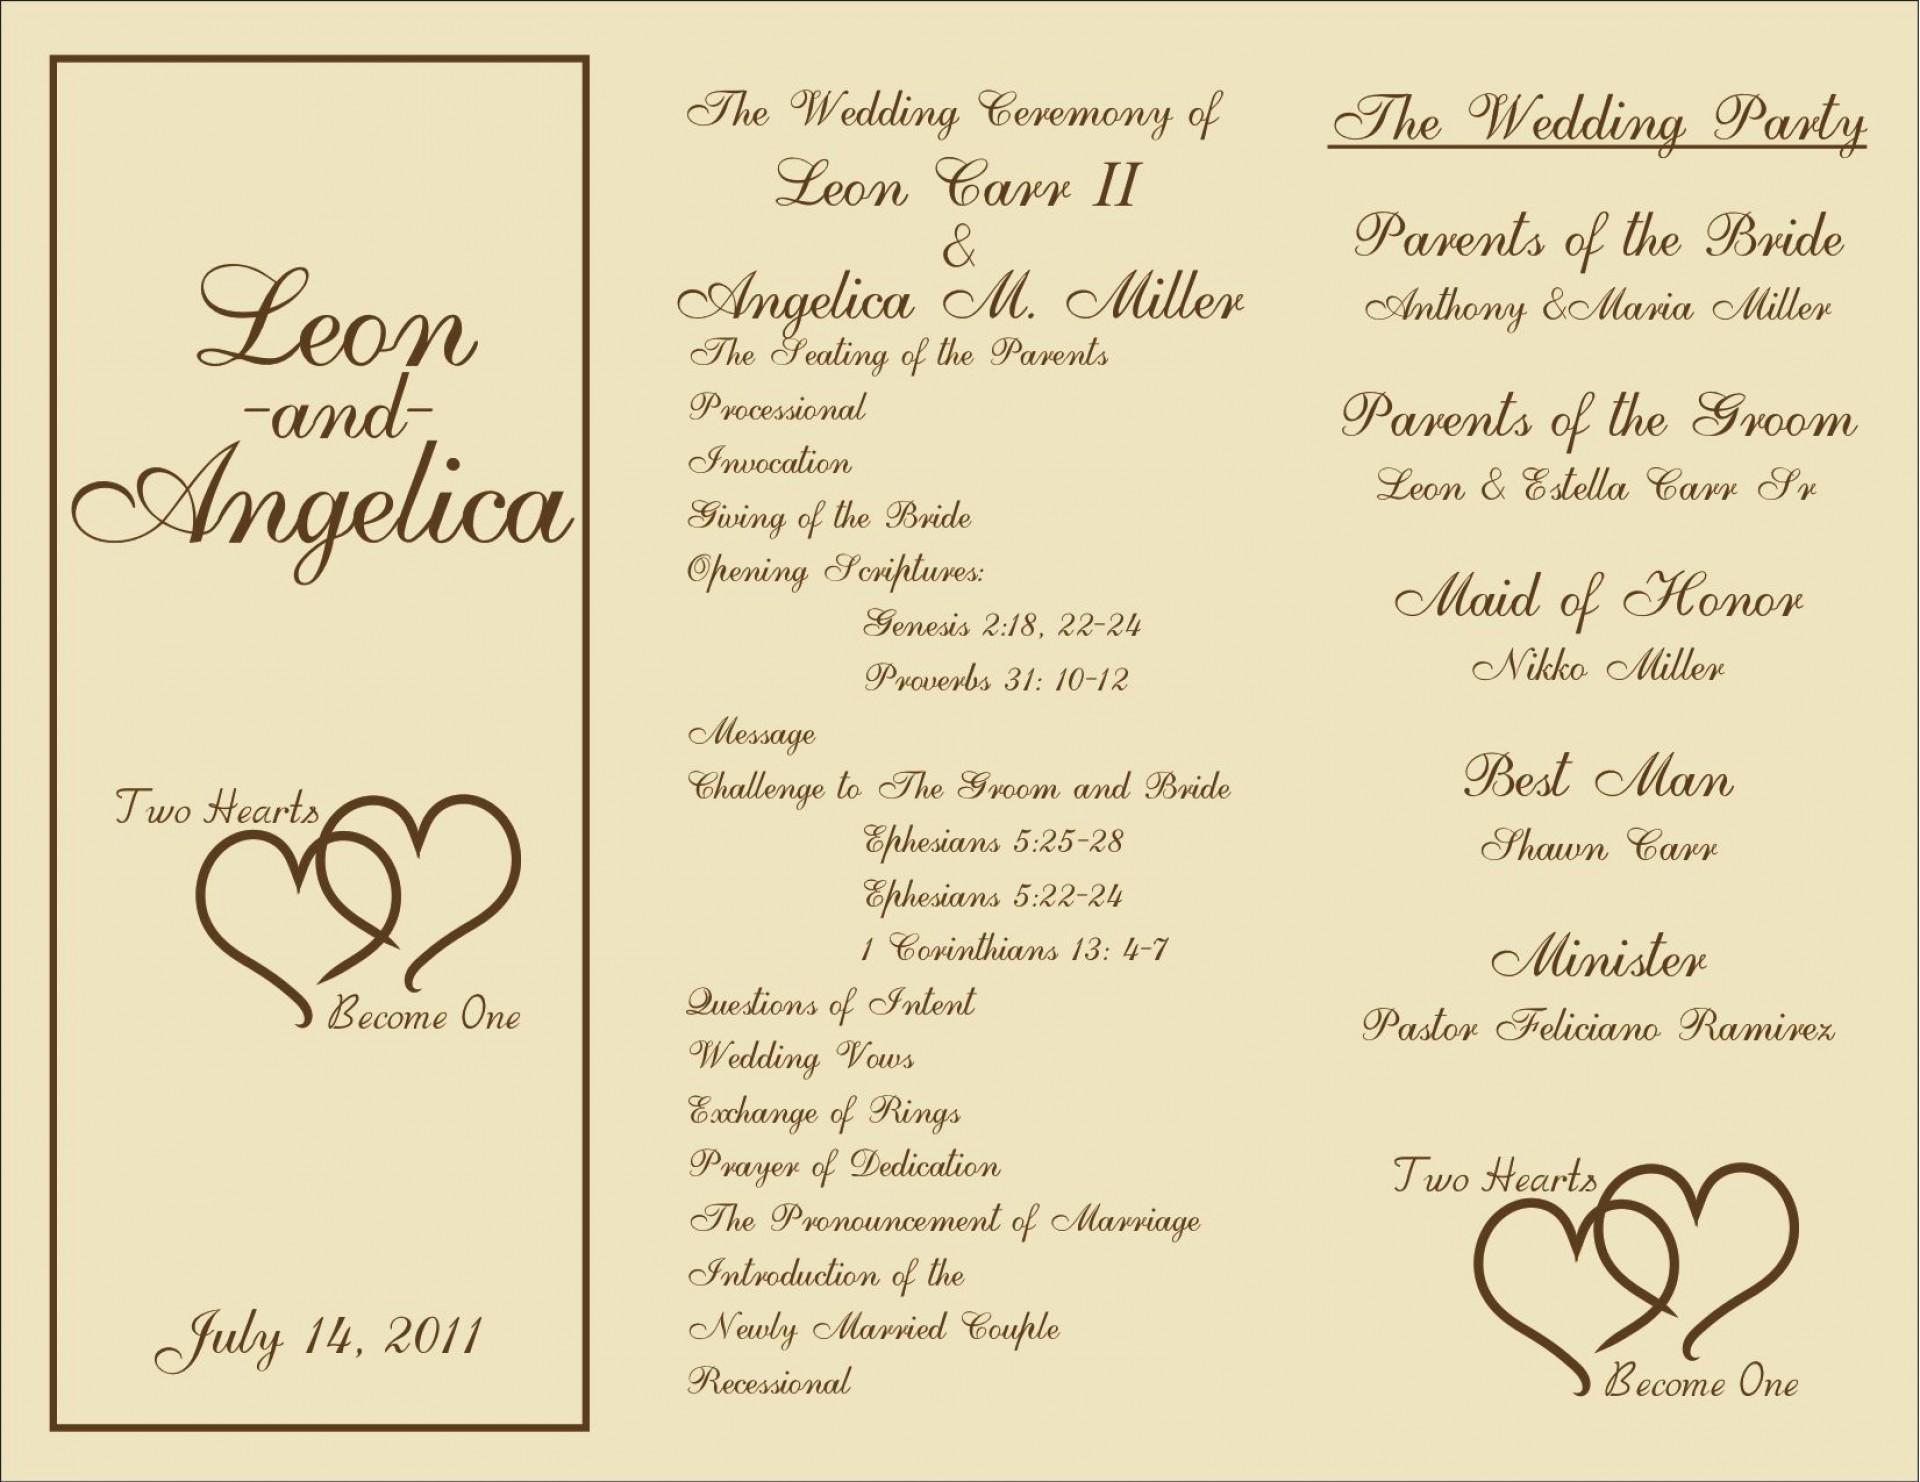 004 Impressive Wedding Program Template Free Sample  Fan Download Elegant1920